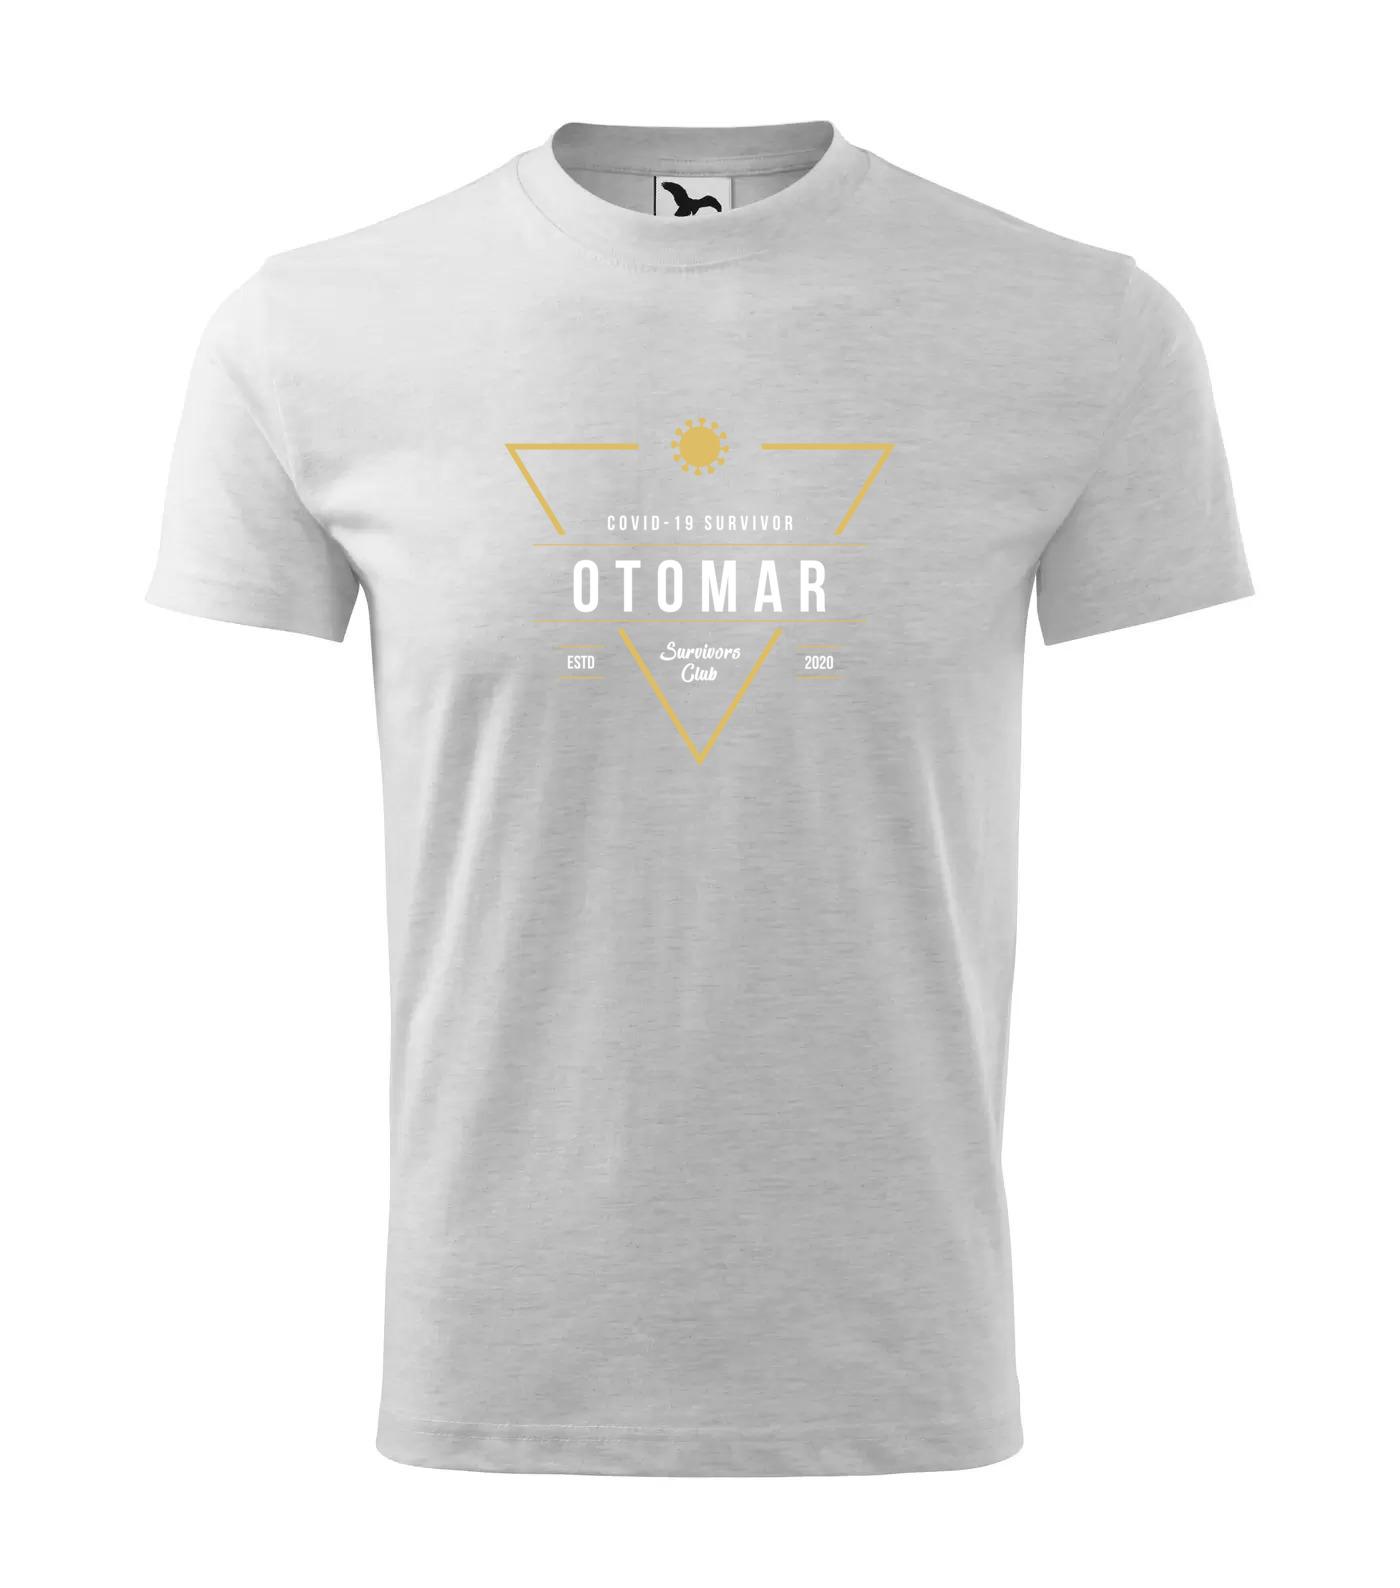 Tričko Survivor Club Otomar